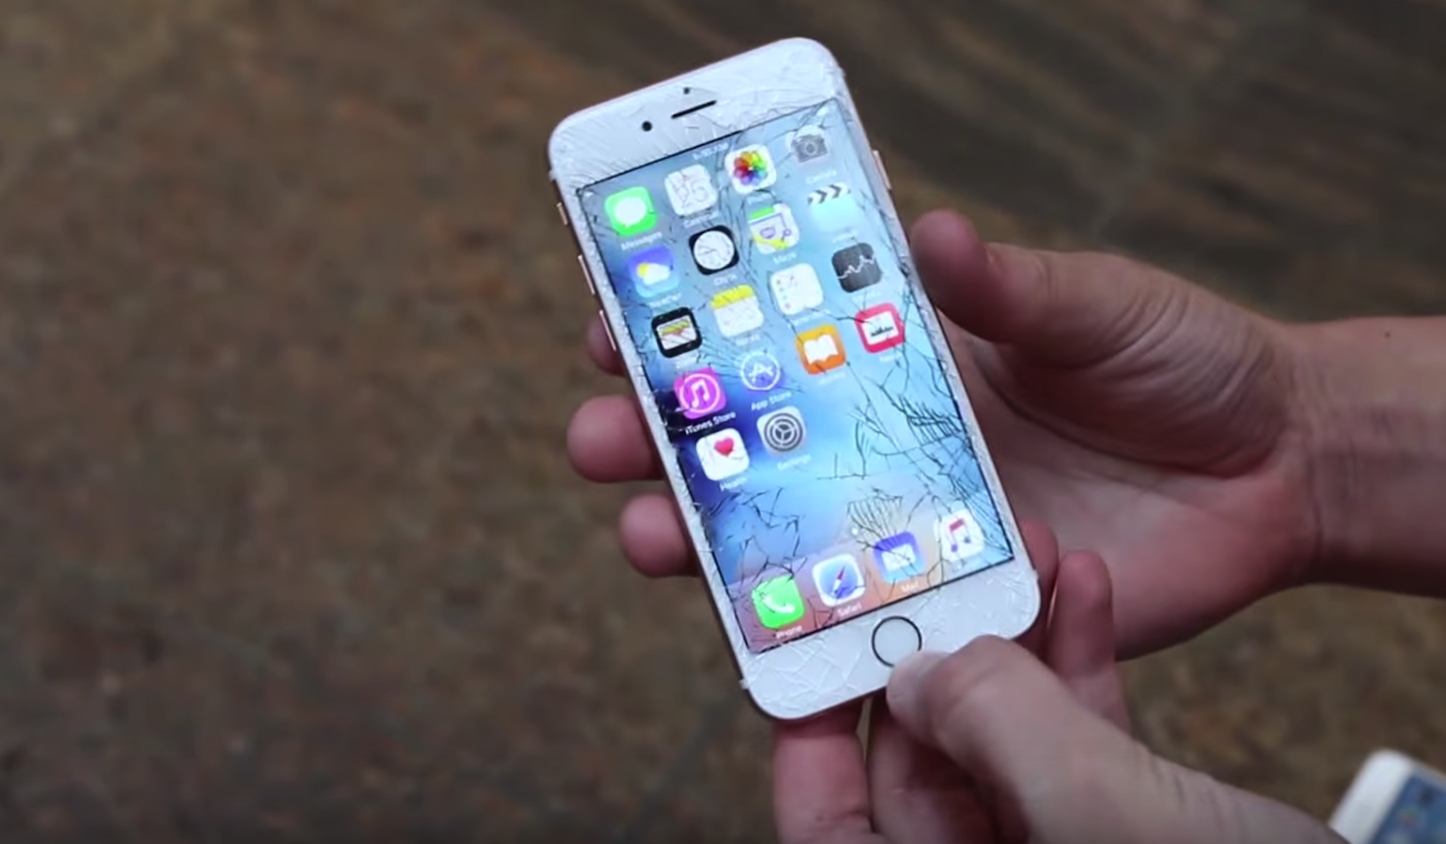 iphone6s6splus-drop-test-2.png